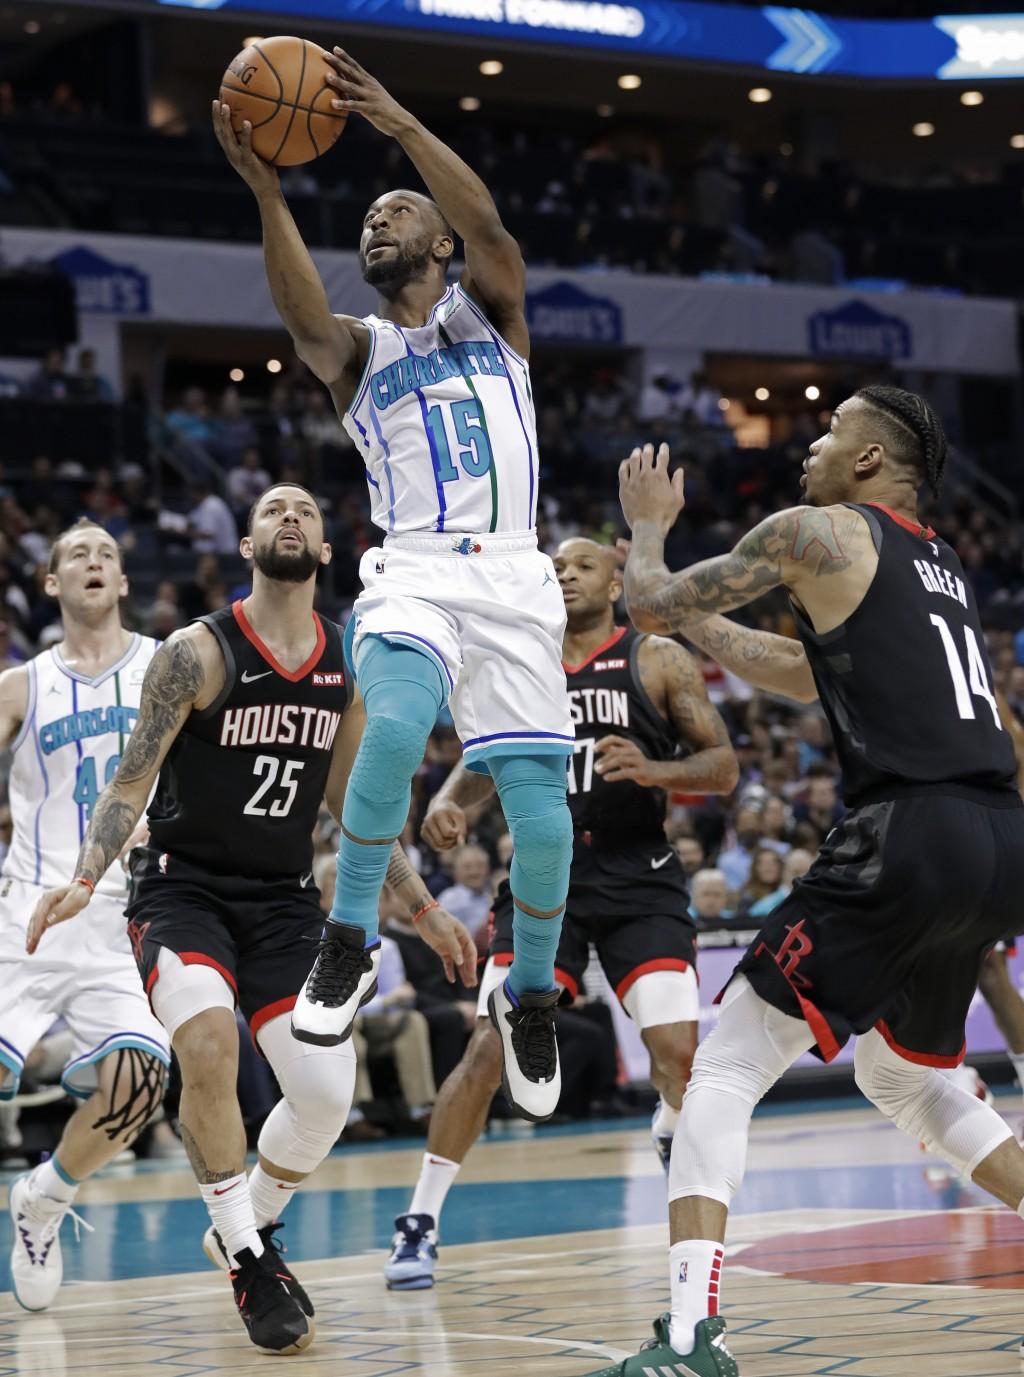 Charlotte Hornets' Kemba Walker (15) shoots between Houston Rockets' Austin Rivers (25) and Gerald Green (14) during the first half of an NBA basketba